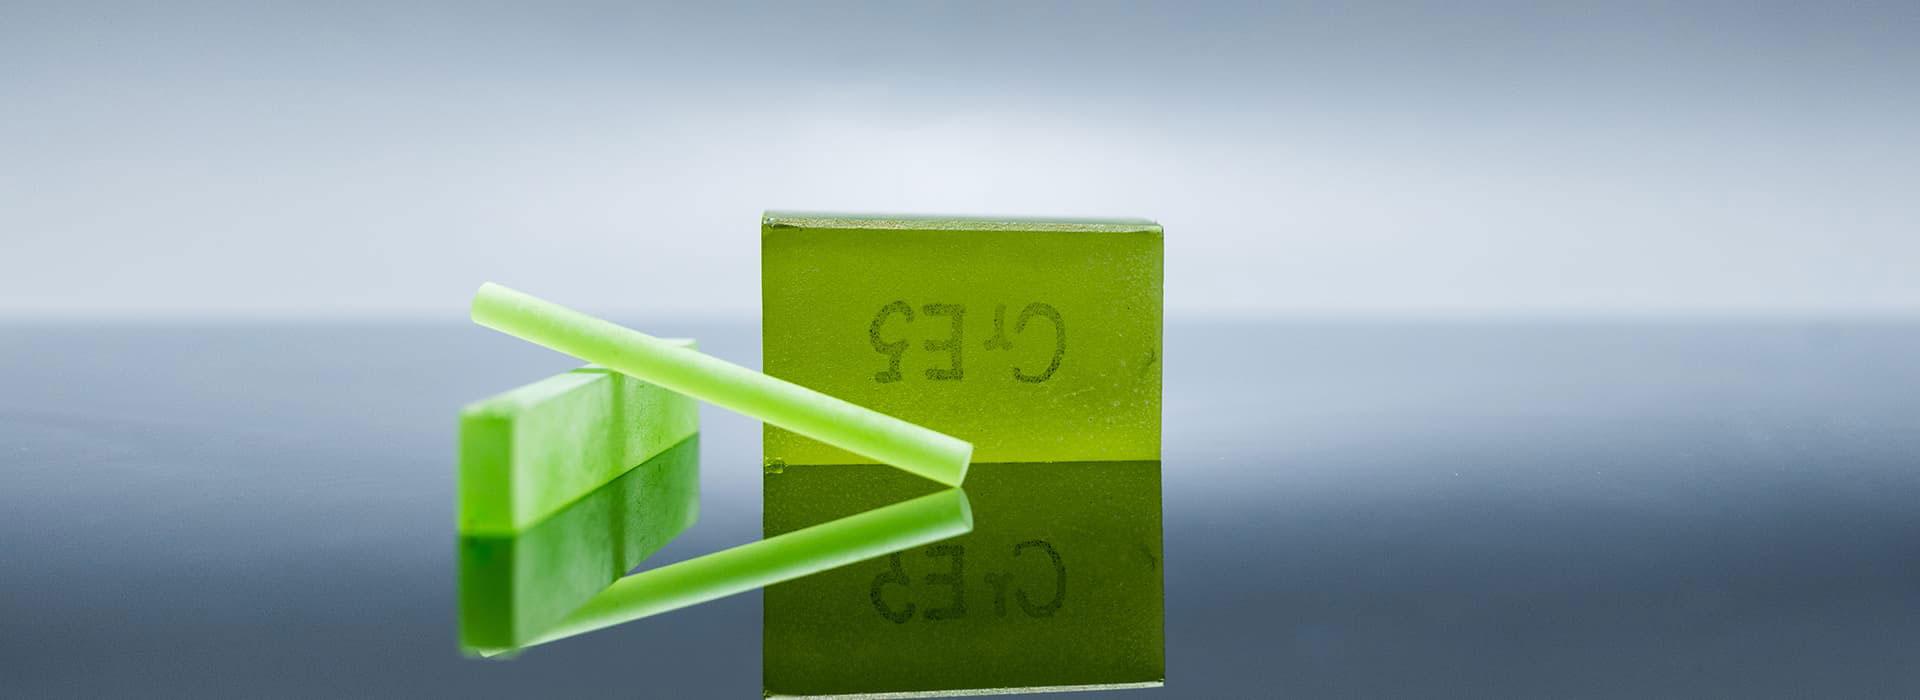 铒玻璃 Er Cr Yb GLASS-激光b玻璃-南京光宝-CRYLINK